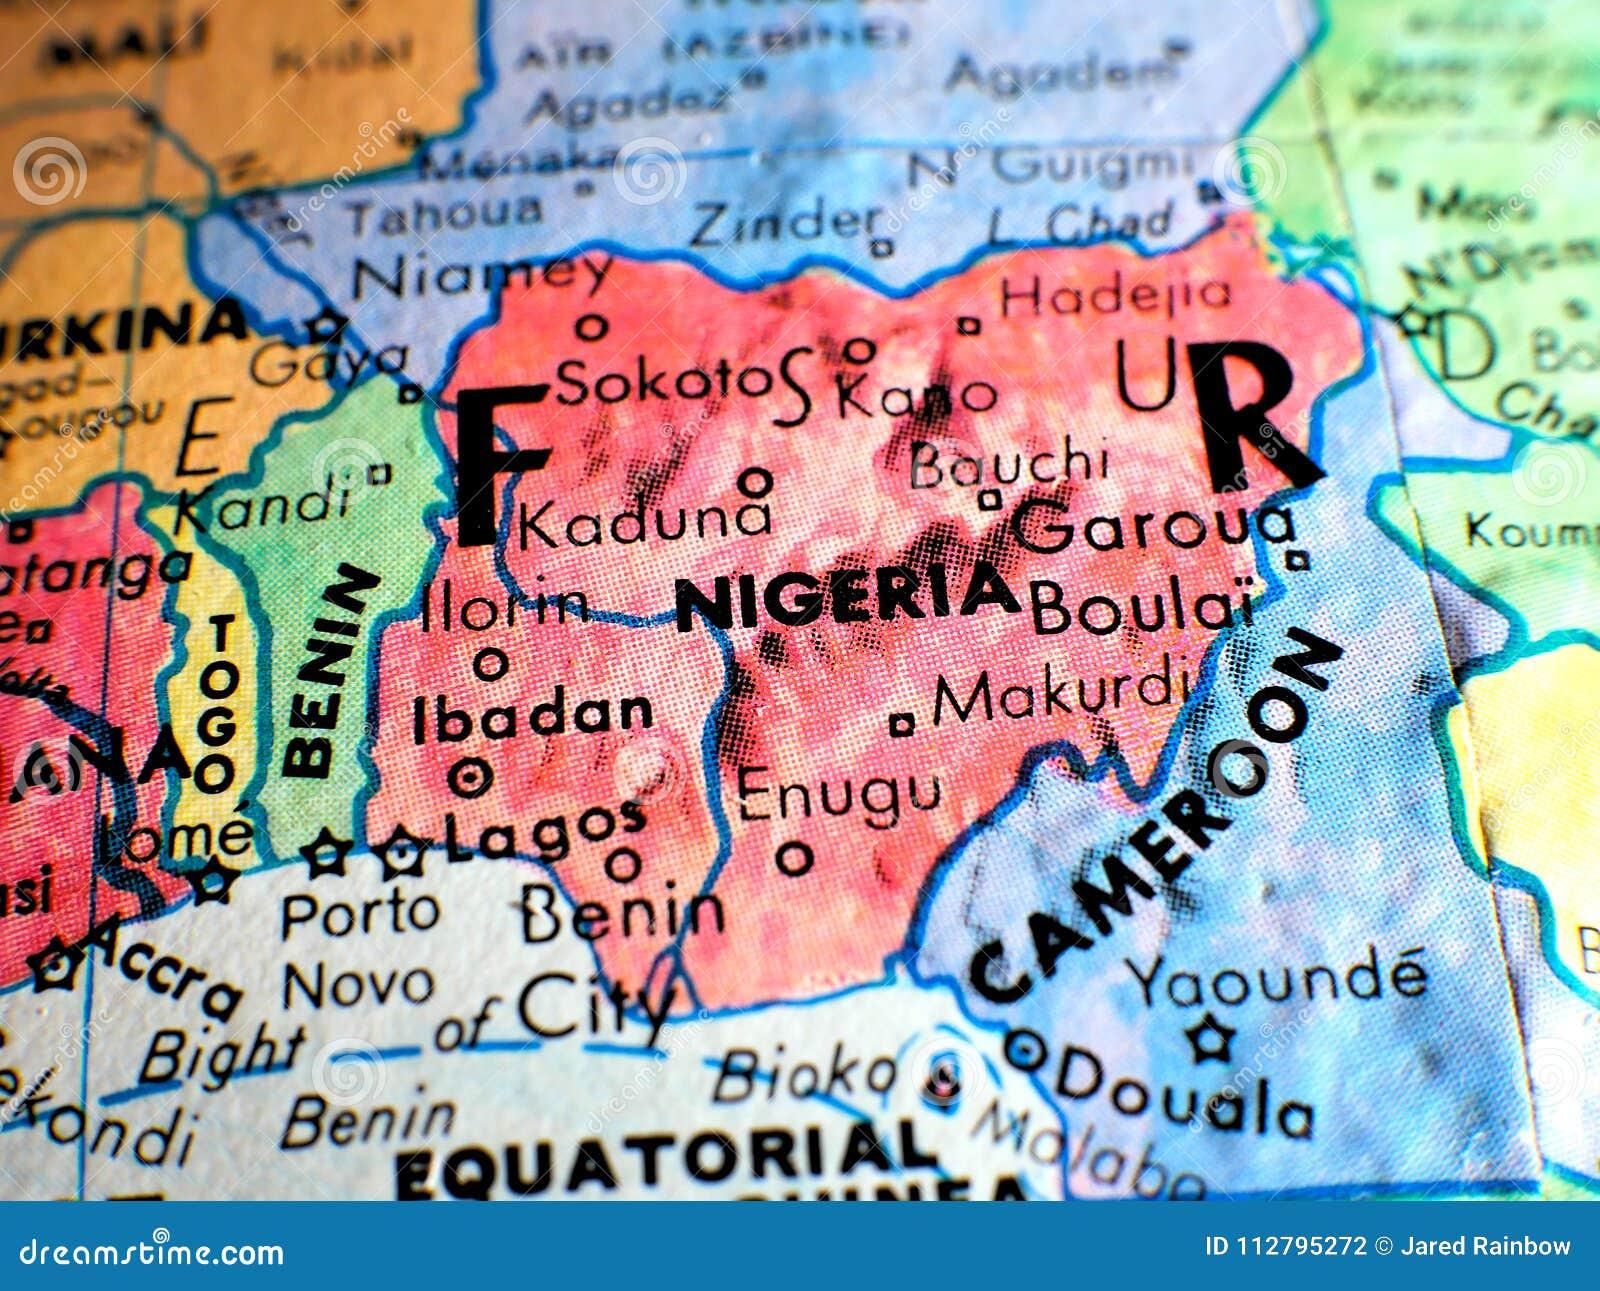 Nigeria Africa Focus Macro Shot On Globe Map For Travel Blogs